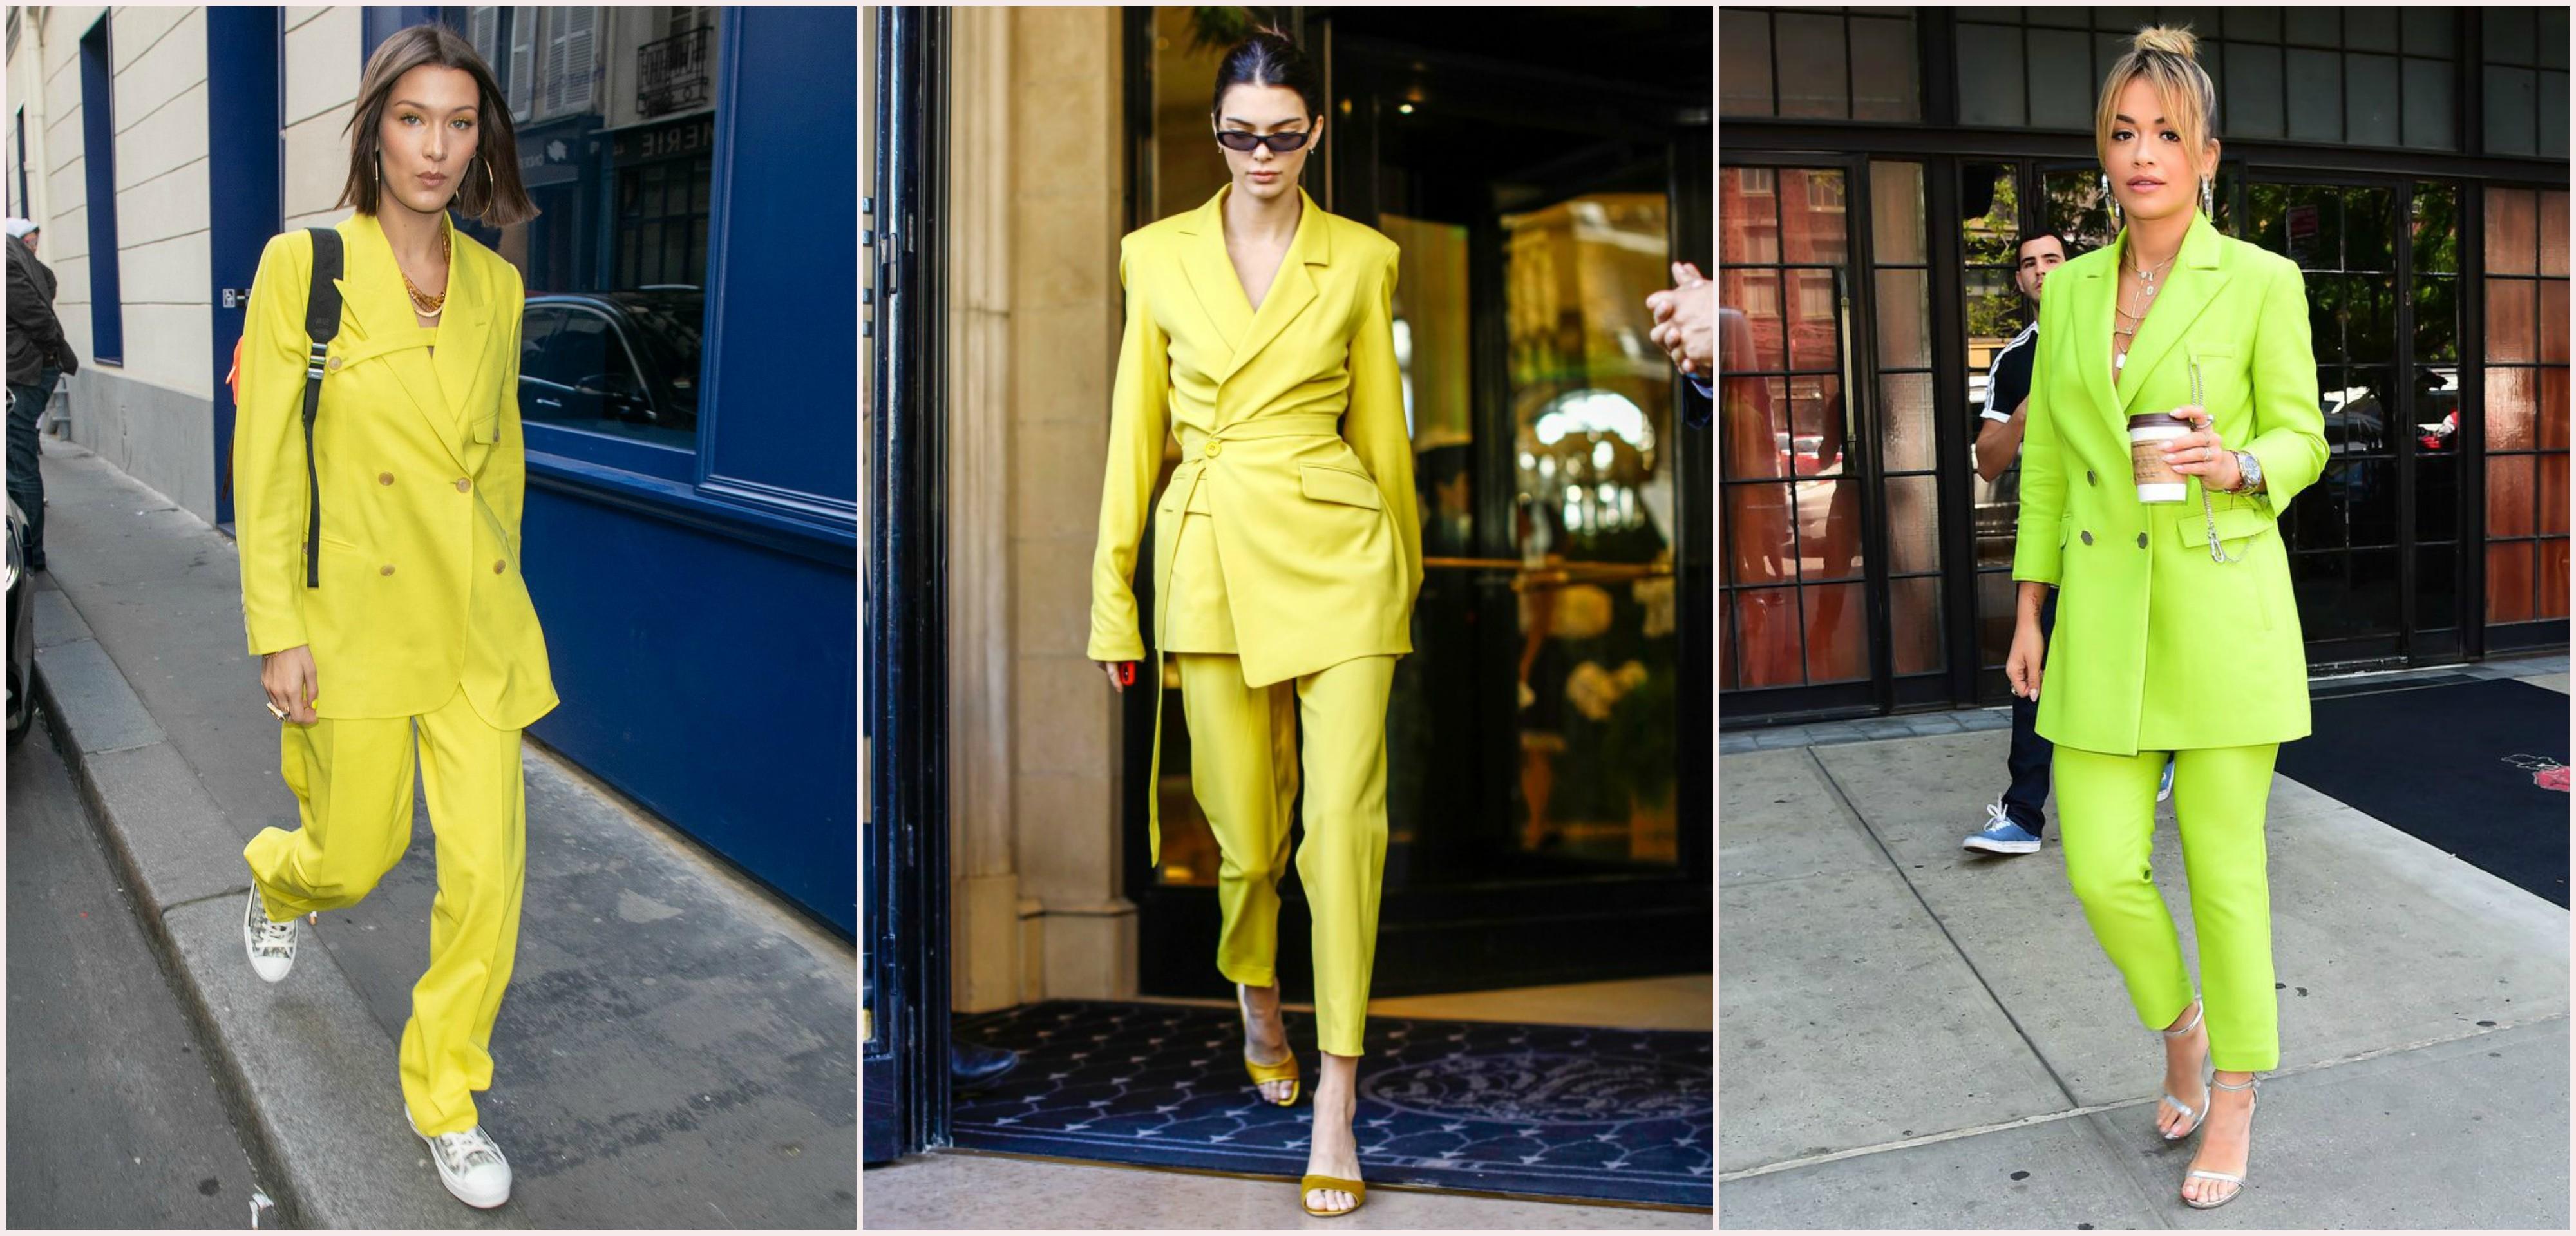 035bbdf76450 Πώς να φορέσετε το κοστούμι ανάλογα με την ηλικία σας - GLOW.GR